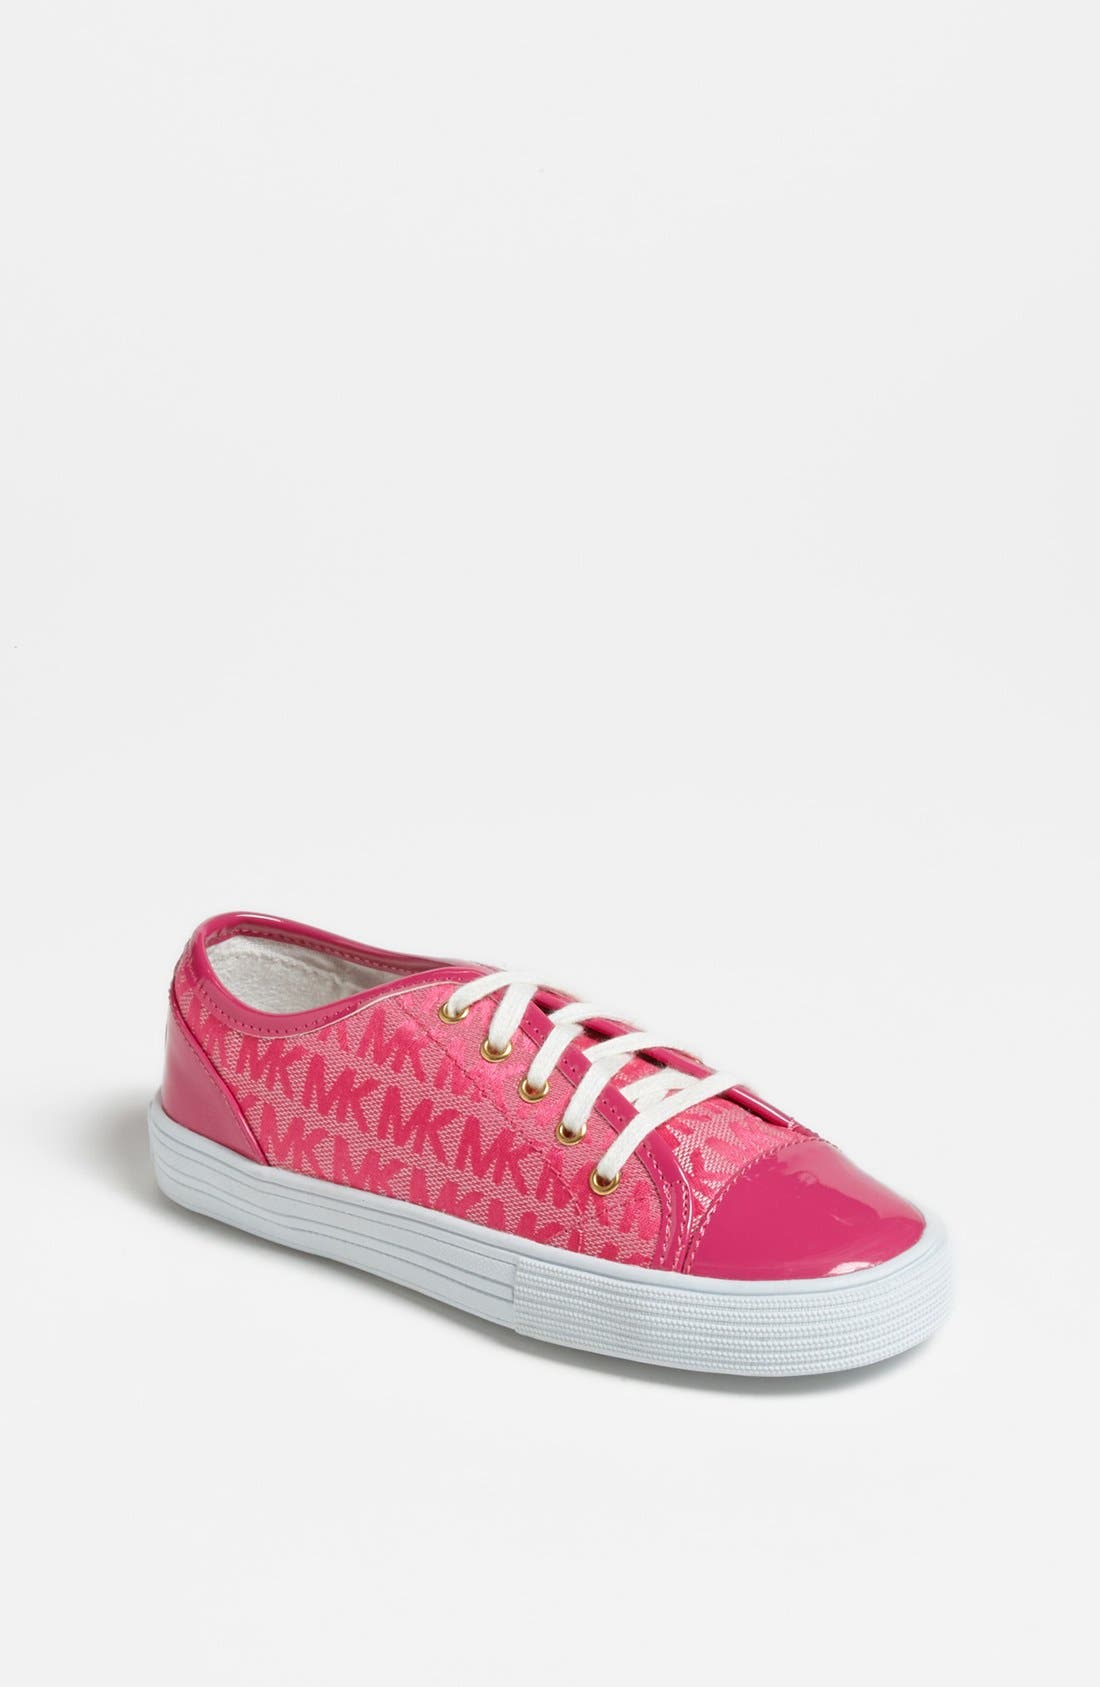 Alternate Image 1 Selected - MICHAEL Michael Kors Sneaker (Toddler, Little Kid & Big Kid)